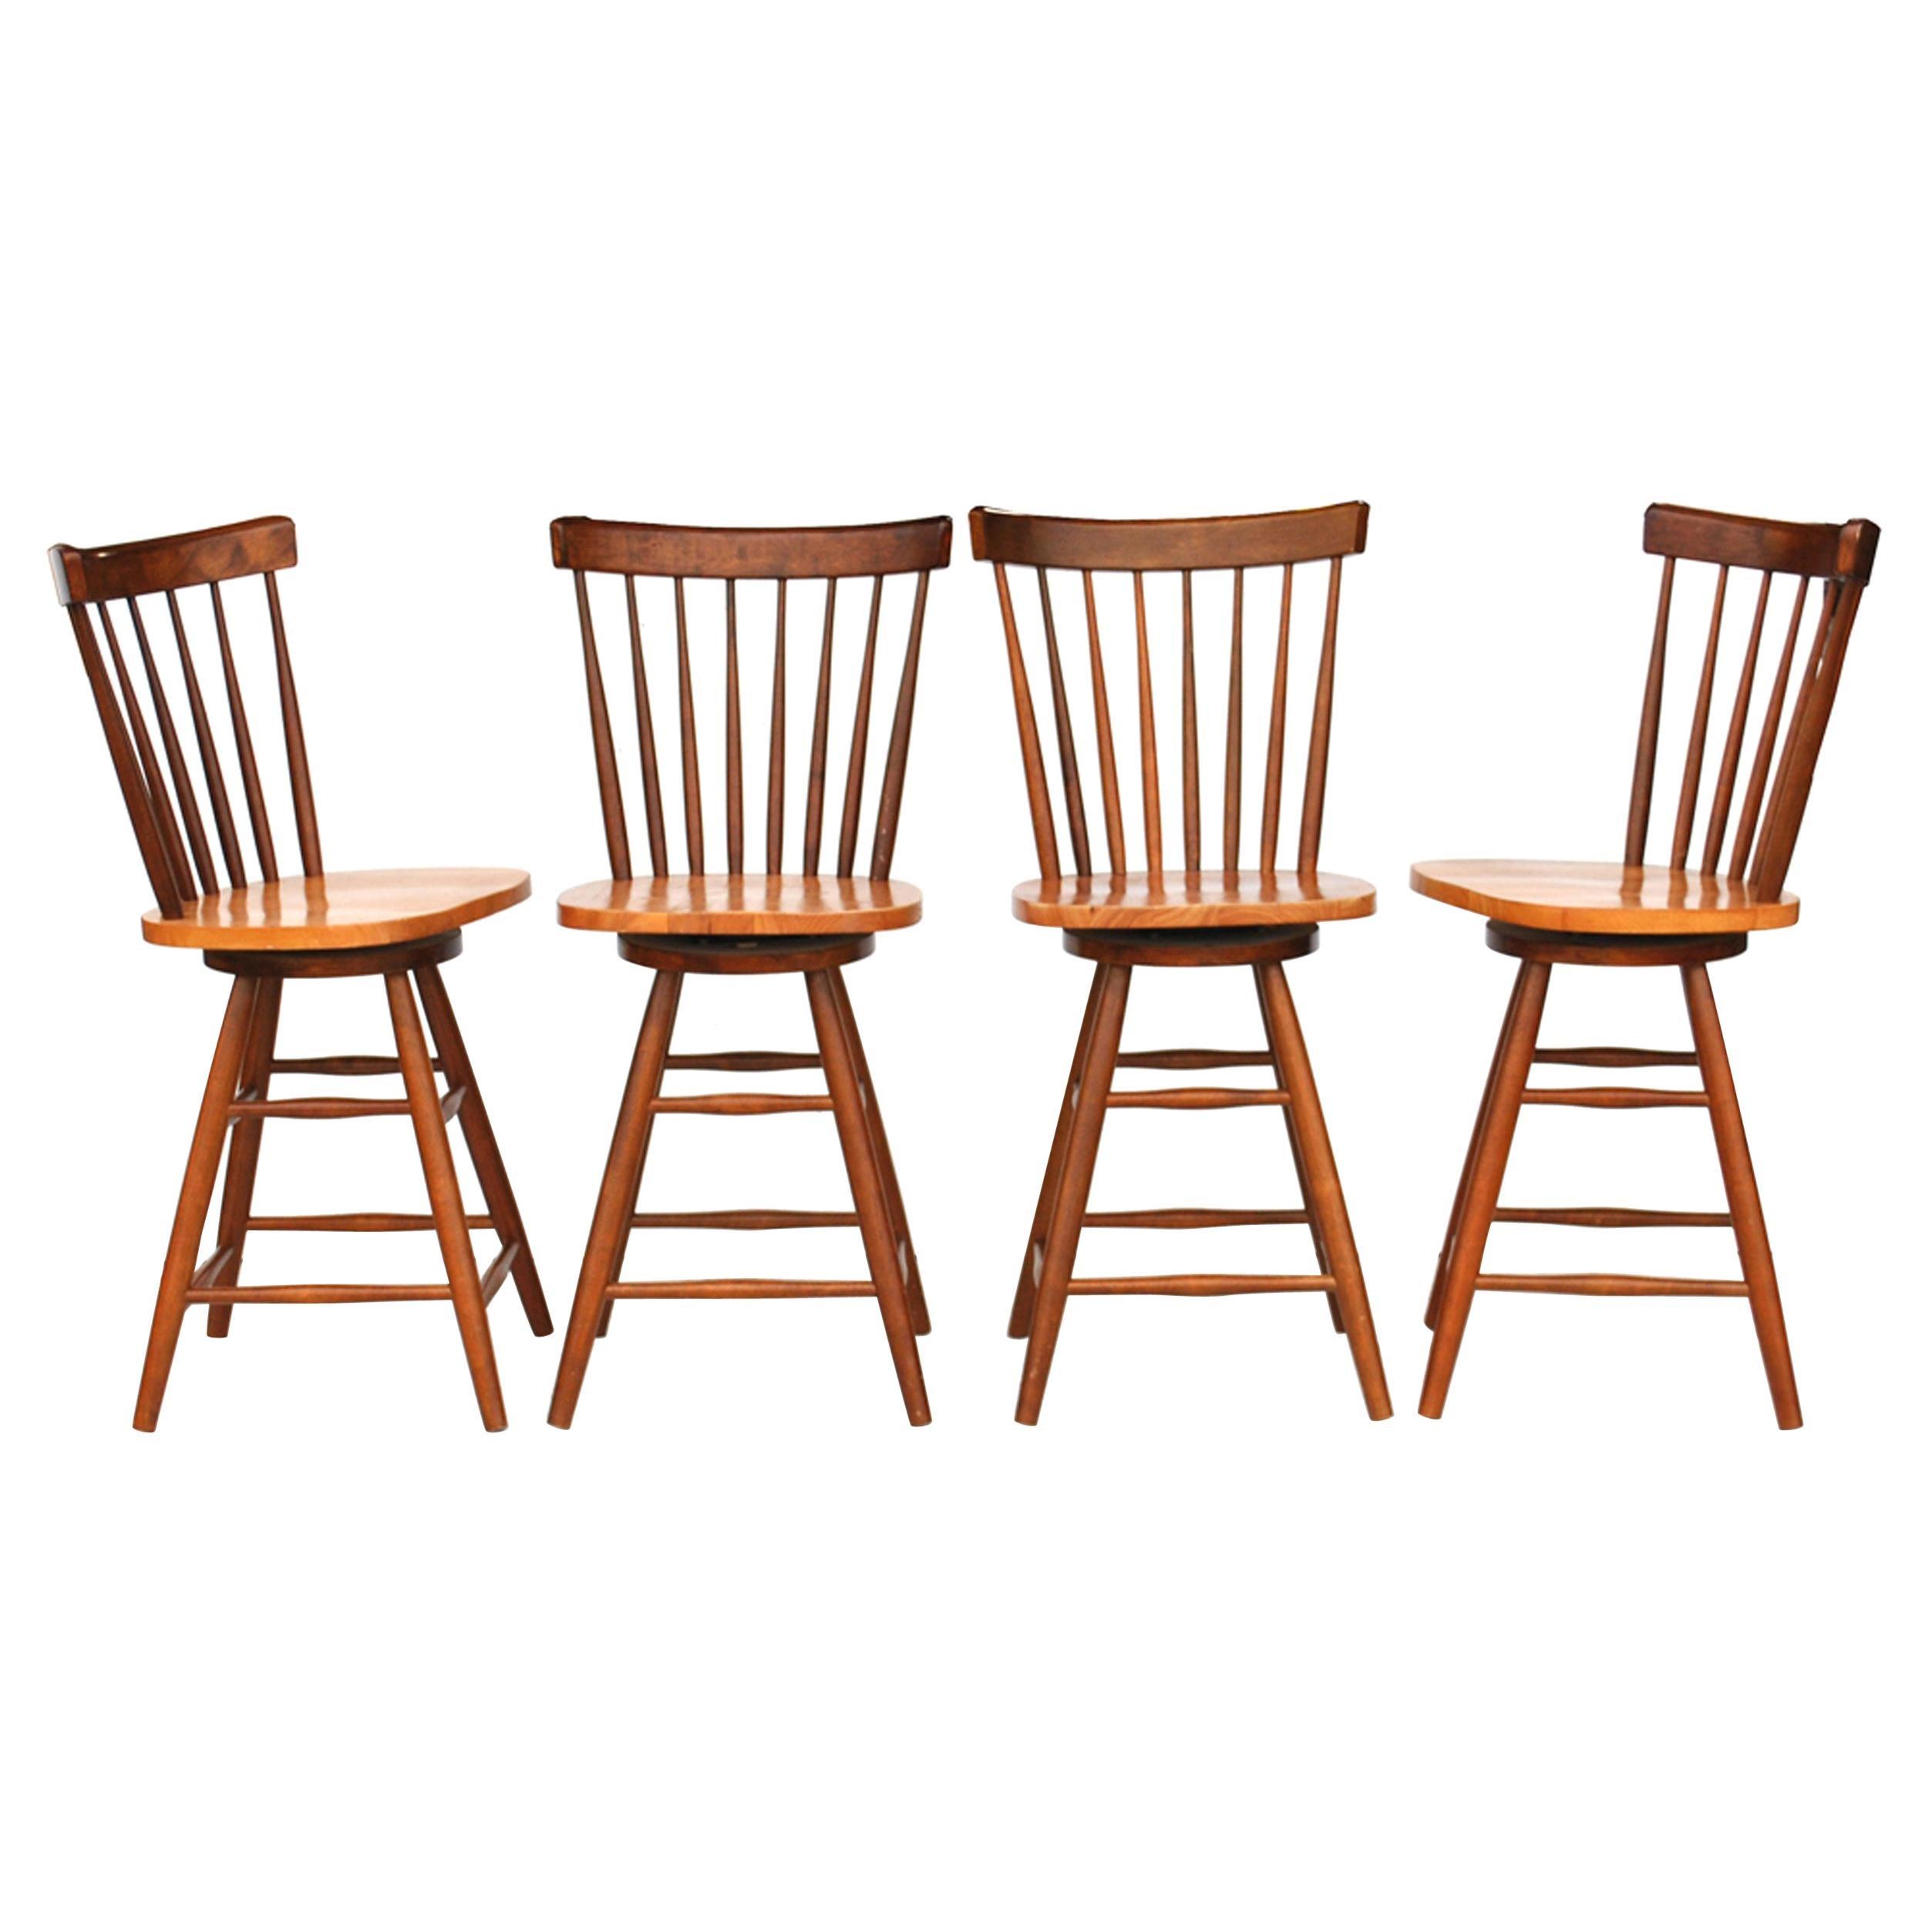 Set of Four Thomasville Teak 24.5 Counter Height Stools